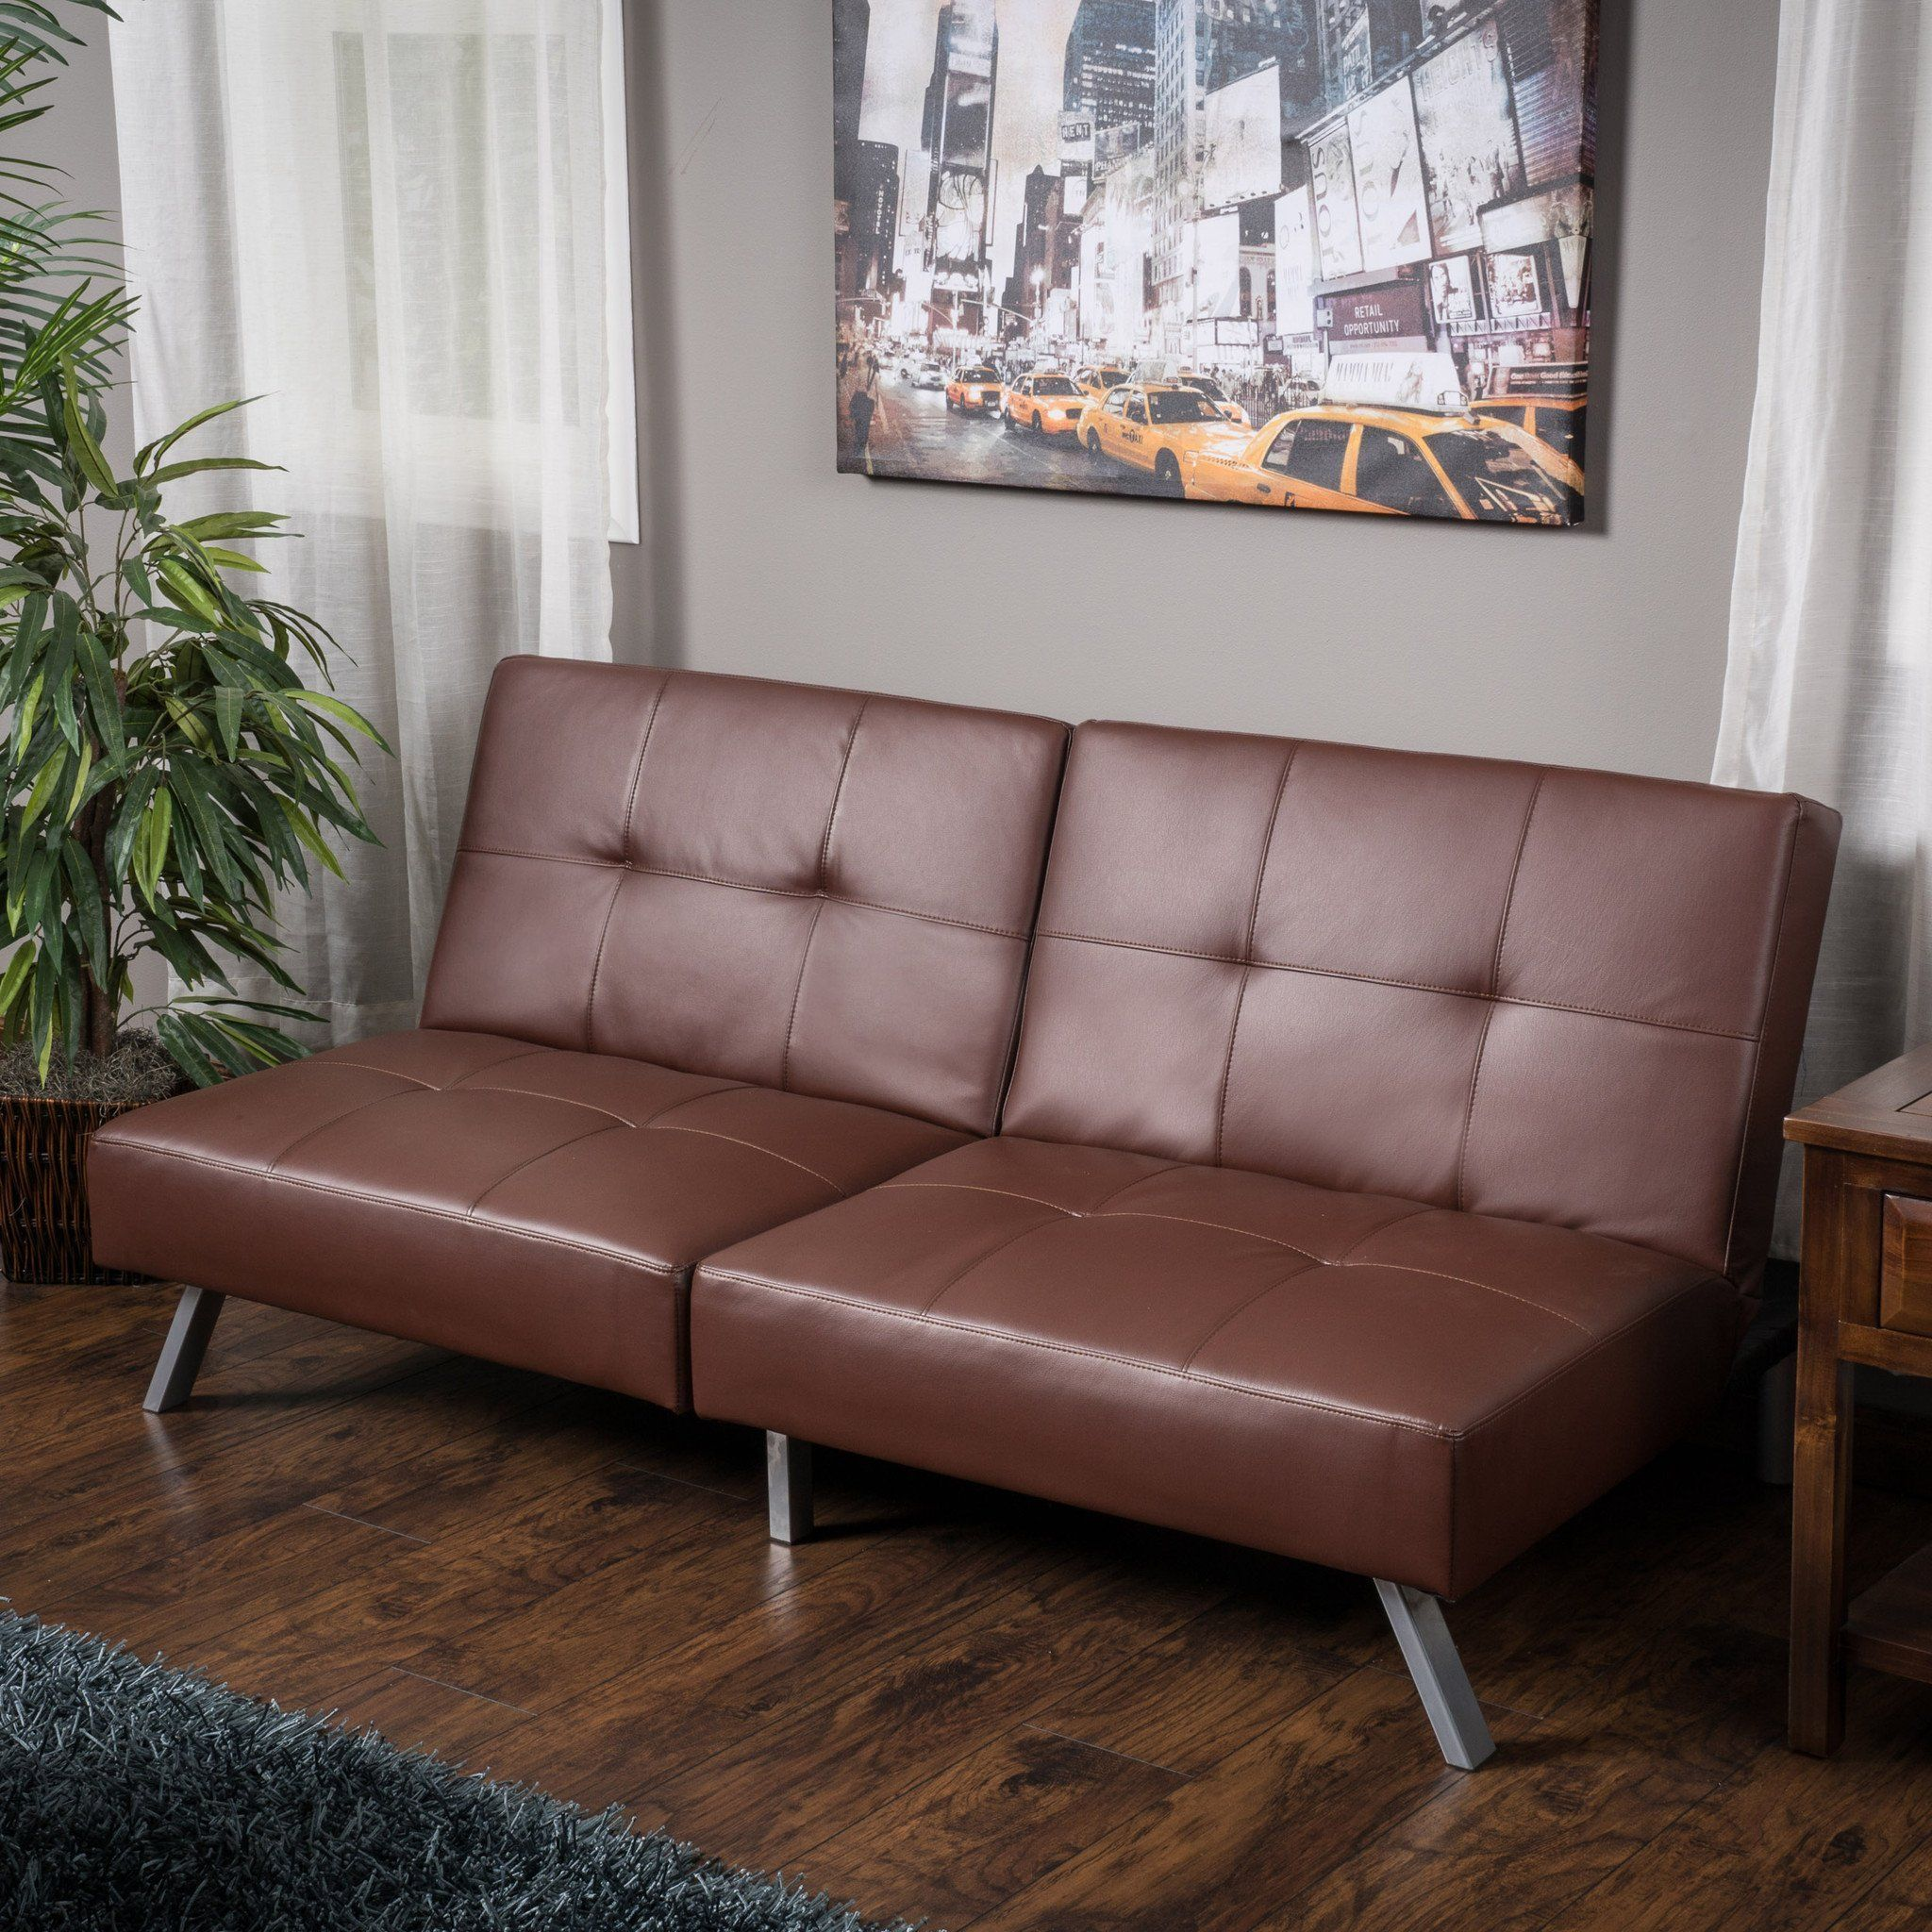 Heston Vinyl Click Clack Futon Sofa Bed Futon sofa bed